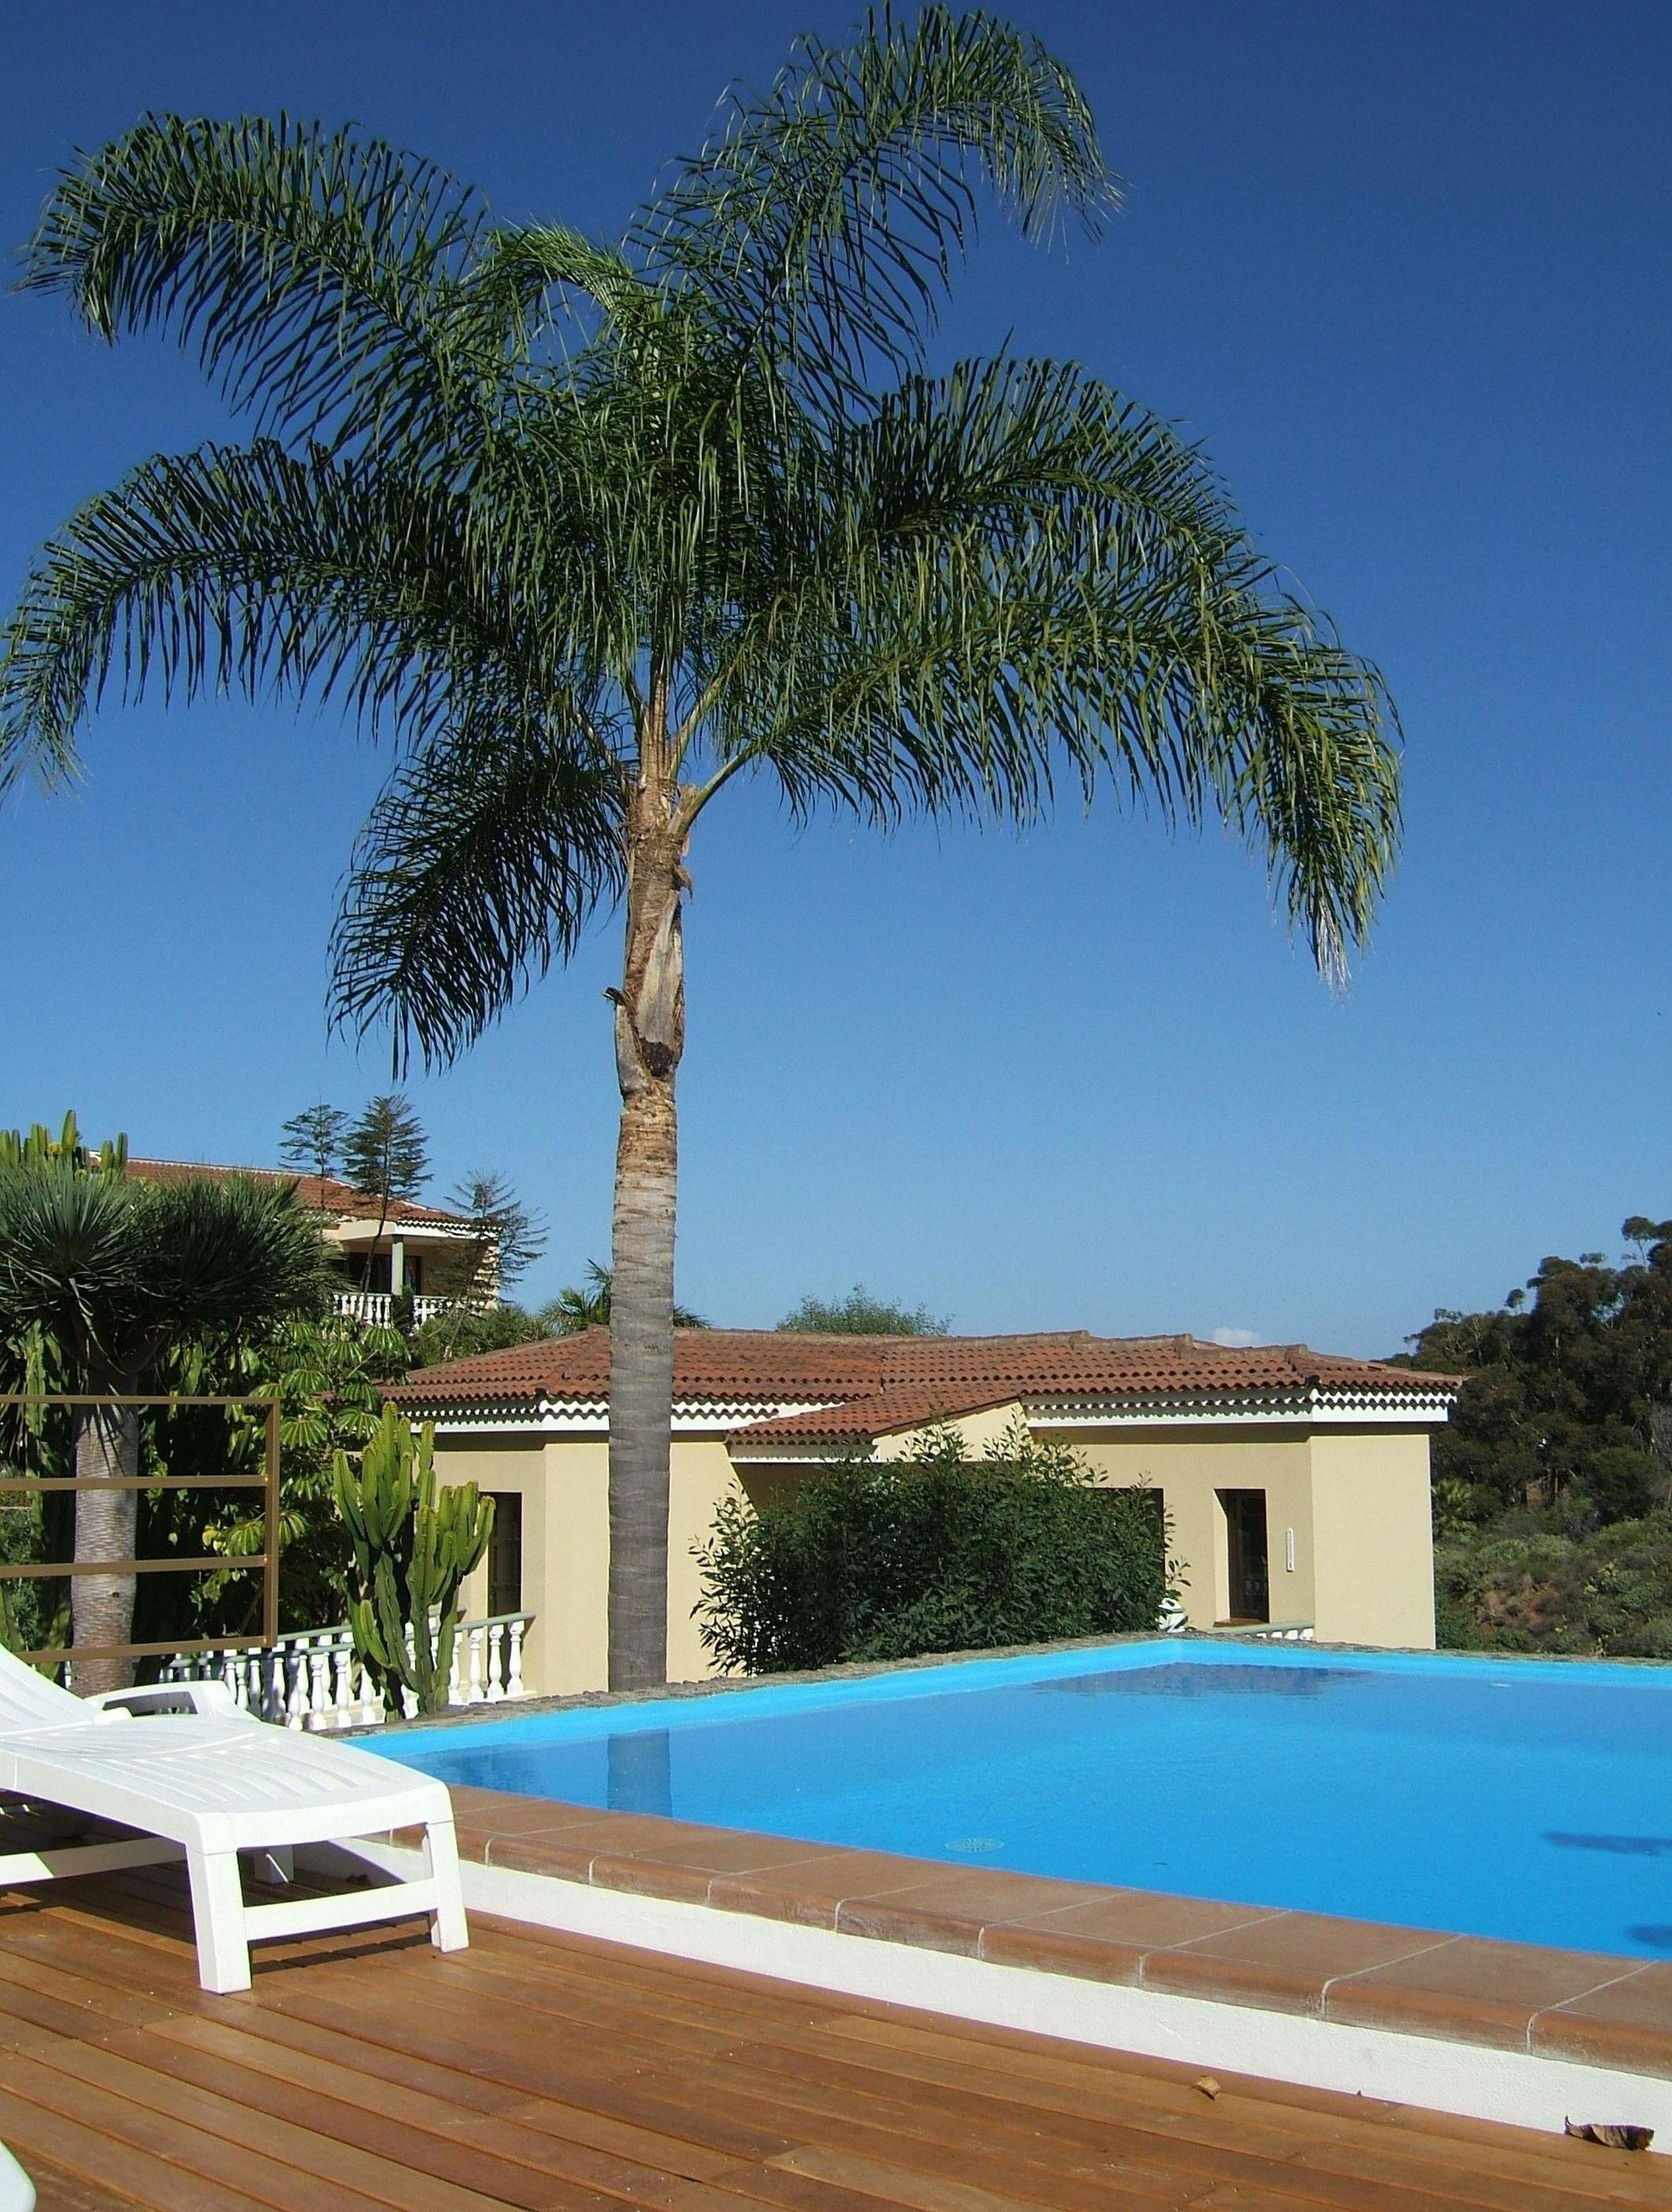 Appartement de vacances Fewo Atico Florasol, sehr ruhig direkt am Naturschutzgebiet, mit Pool, 2 Terrassen, Grill, (2492983), Santa Ursula, Ténérife, Iles Canaries, Espagne, image 1